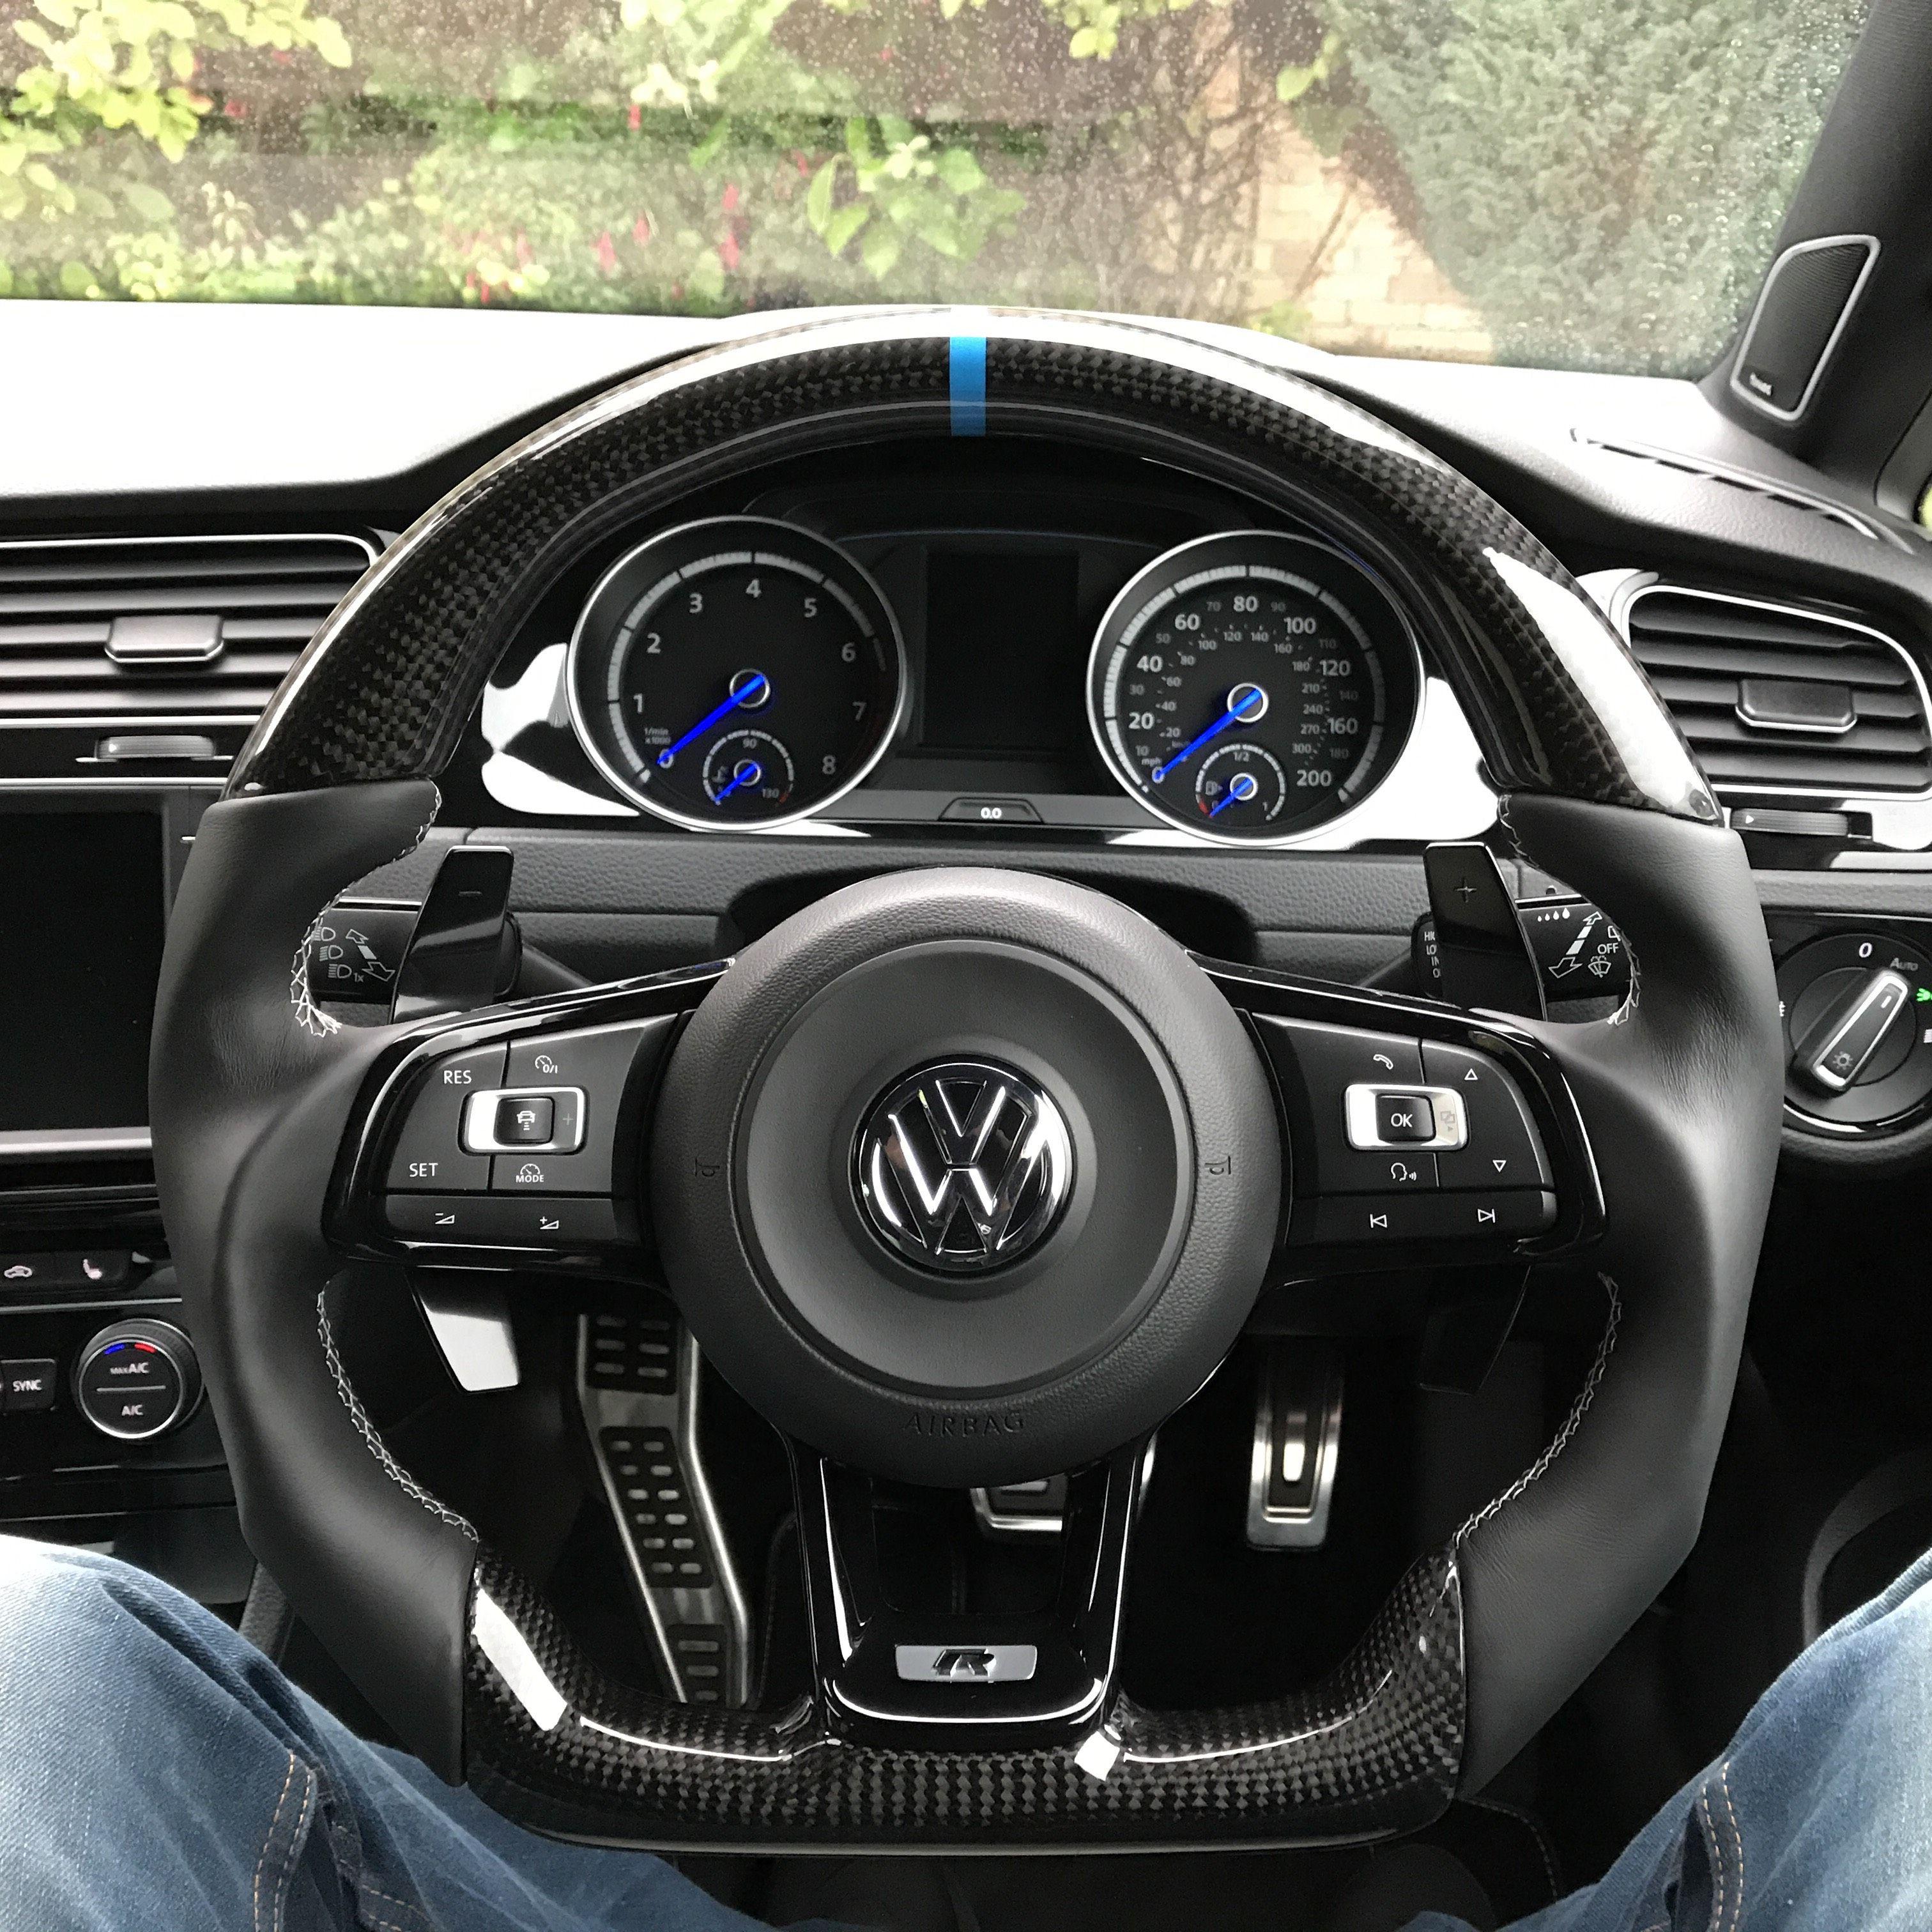 30+ Carbon fibre golf r steering wheel ideas in 2021